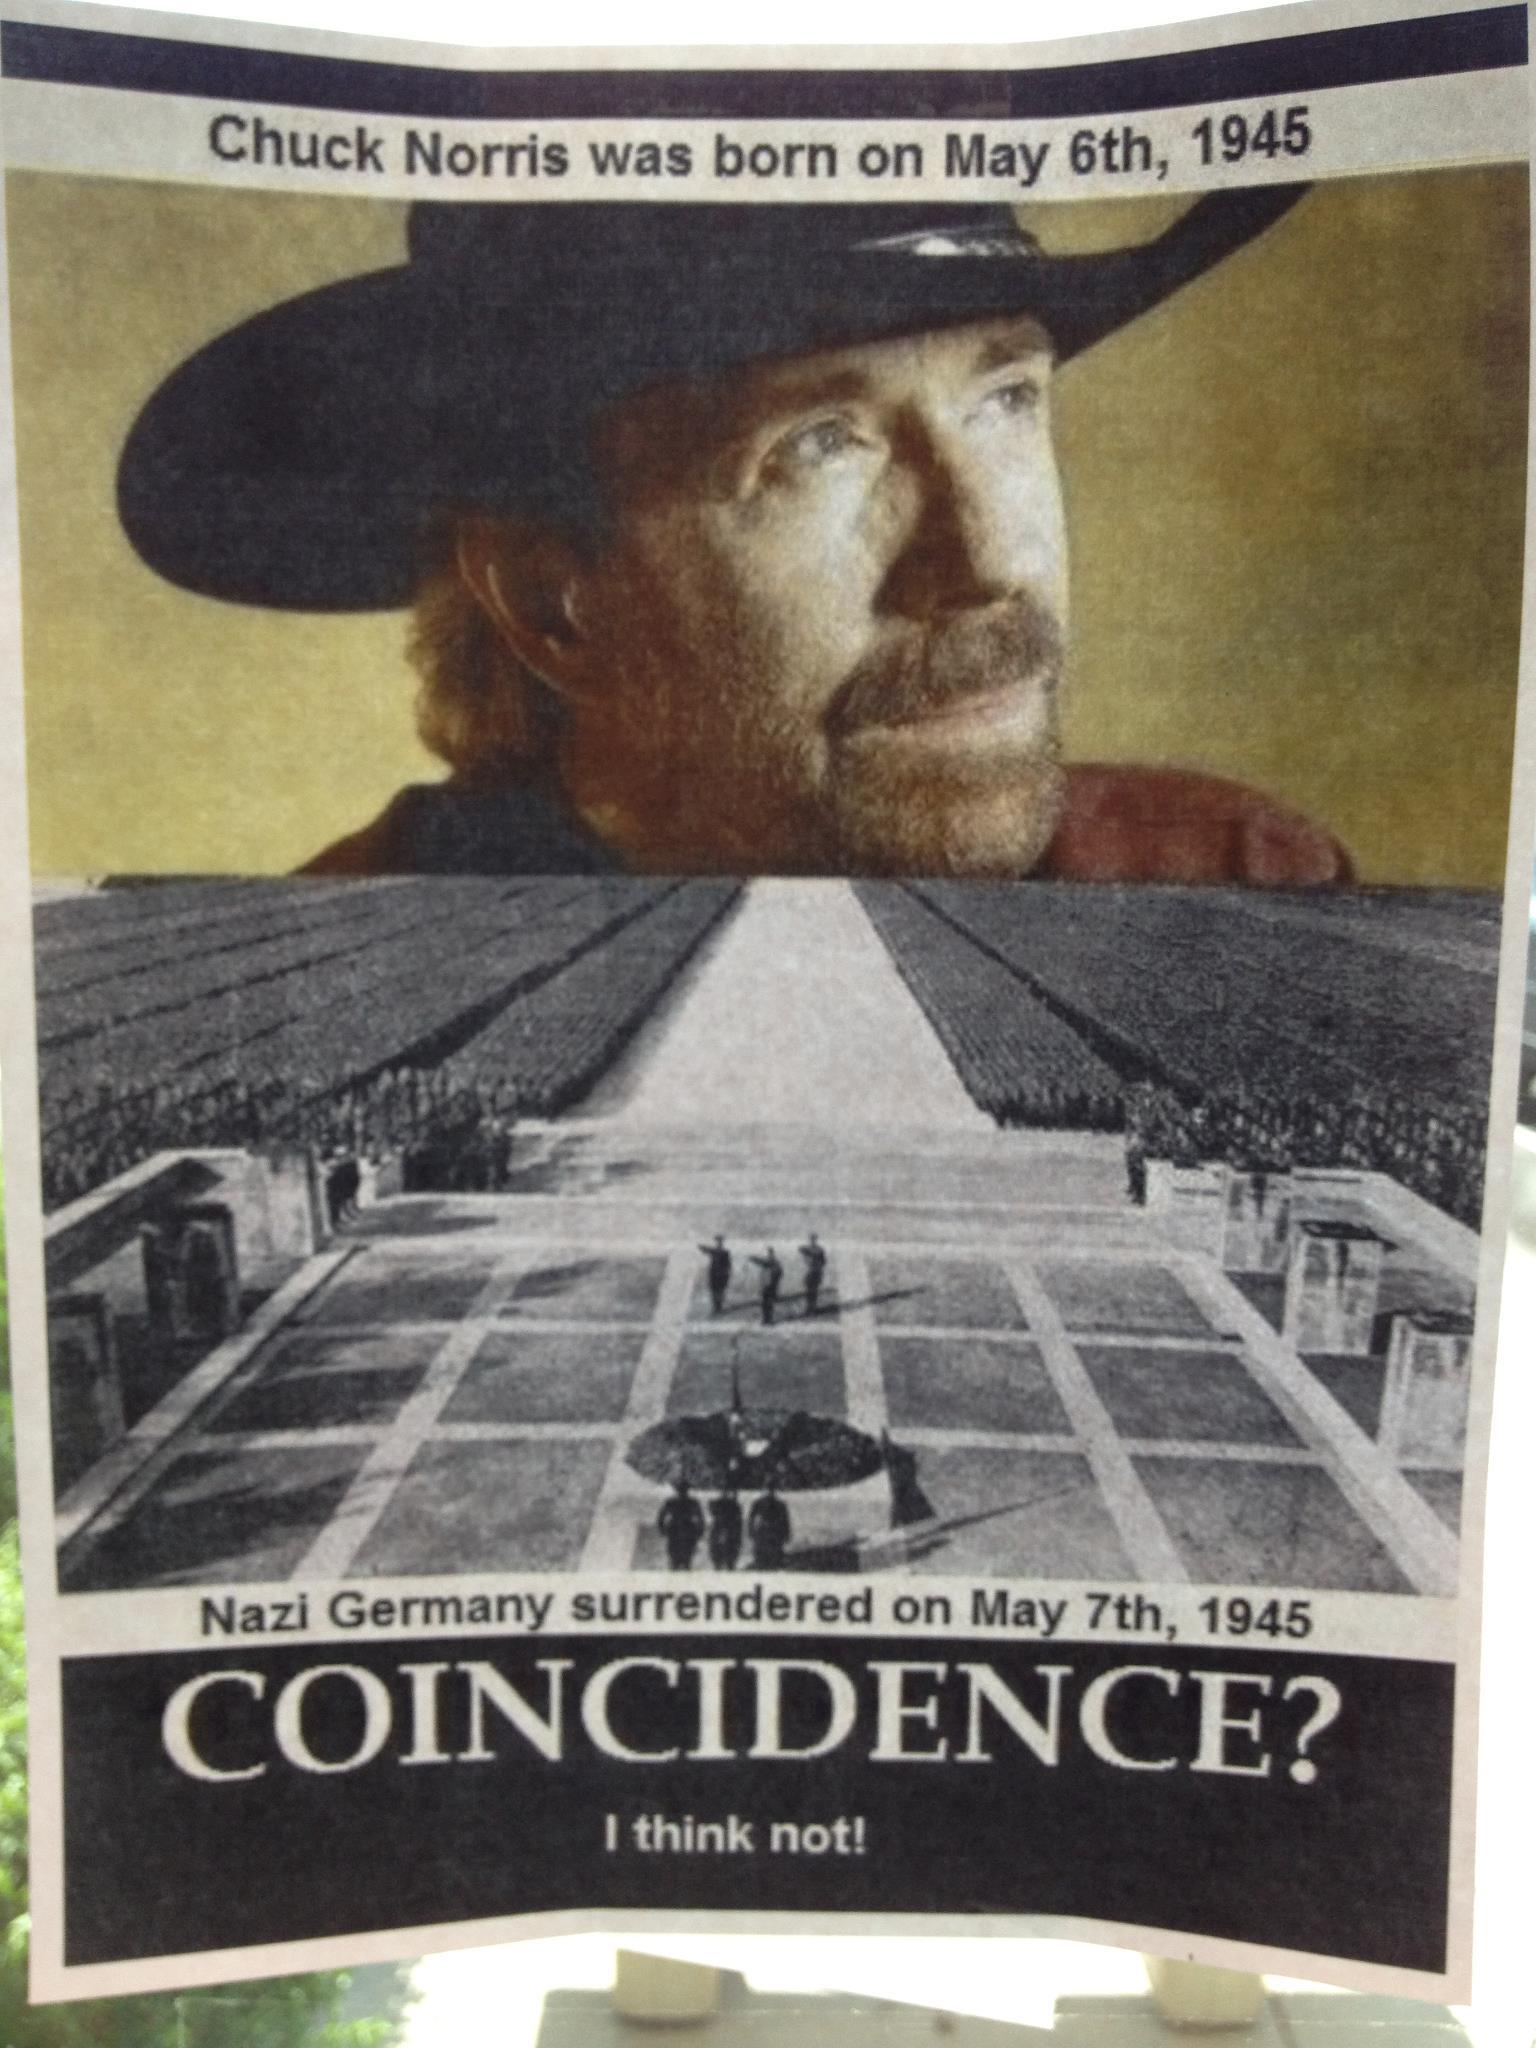 Picture it Chuck Norris is born the nazis surrender